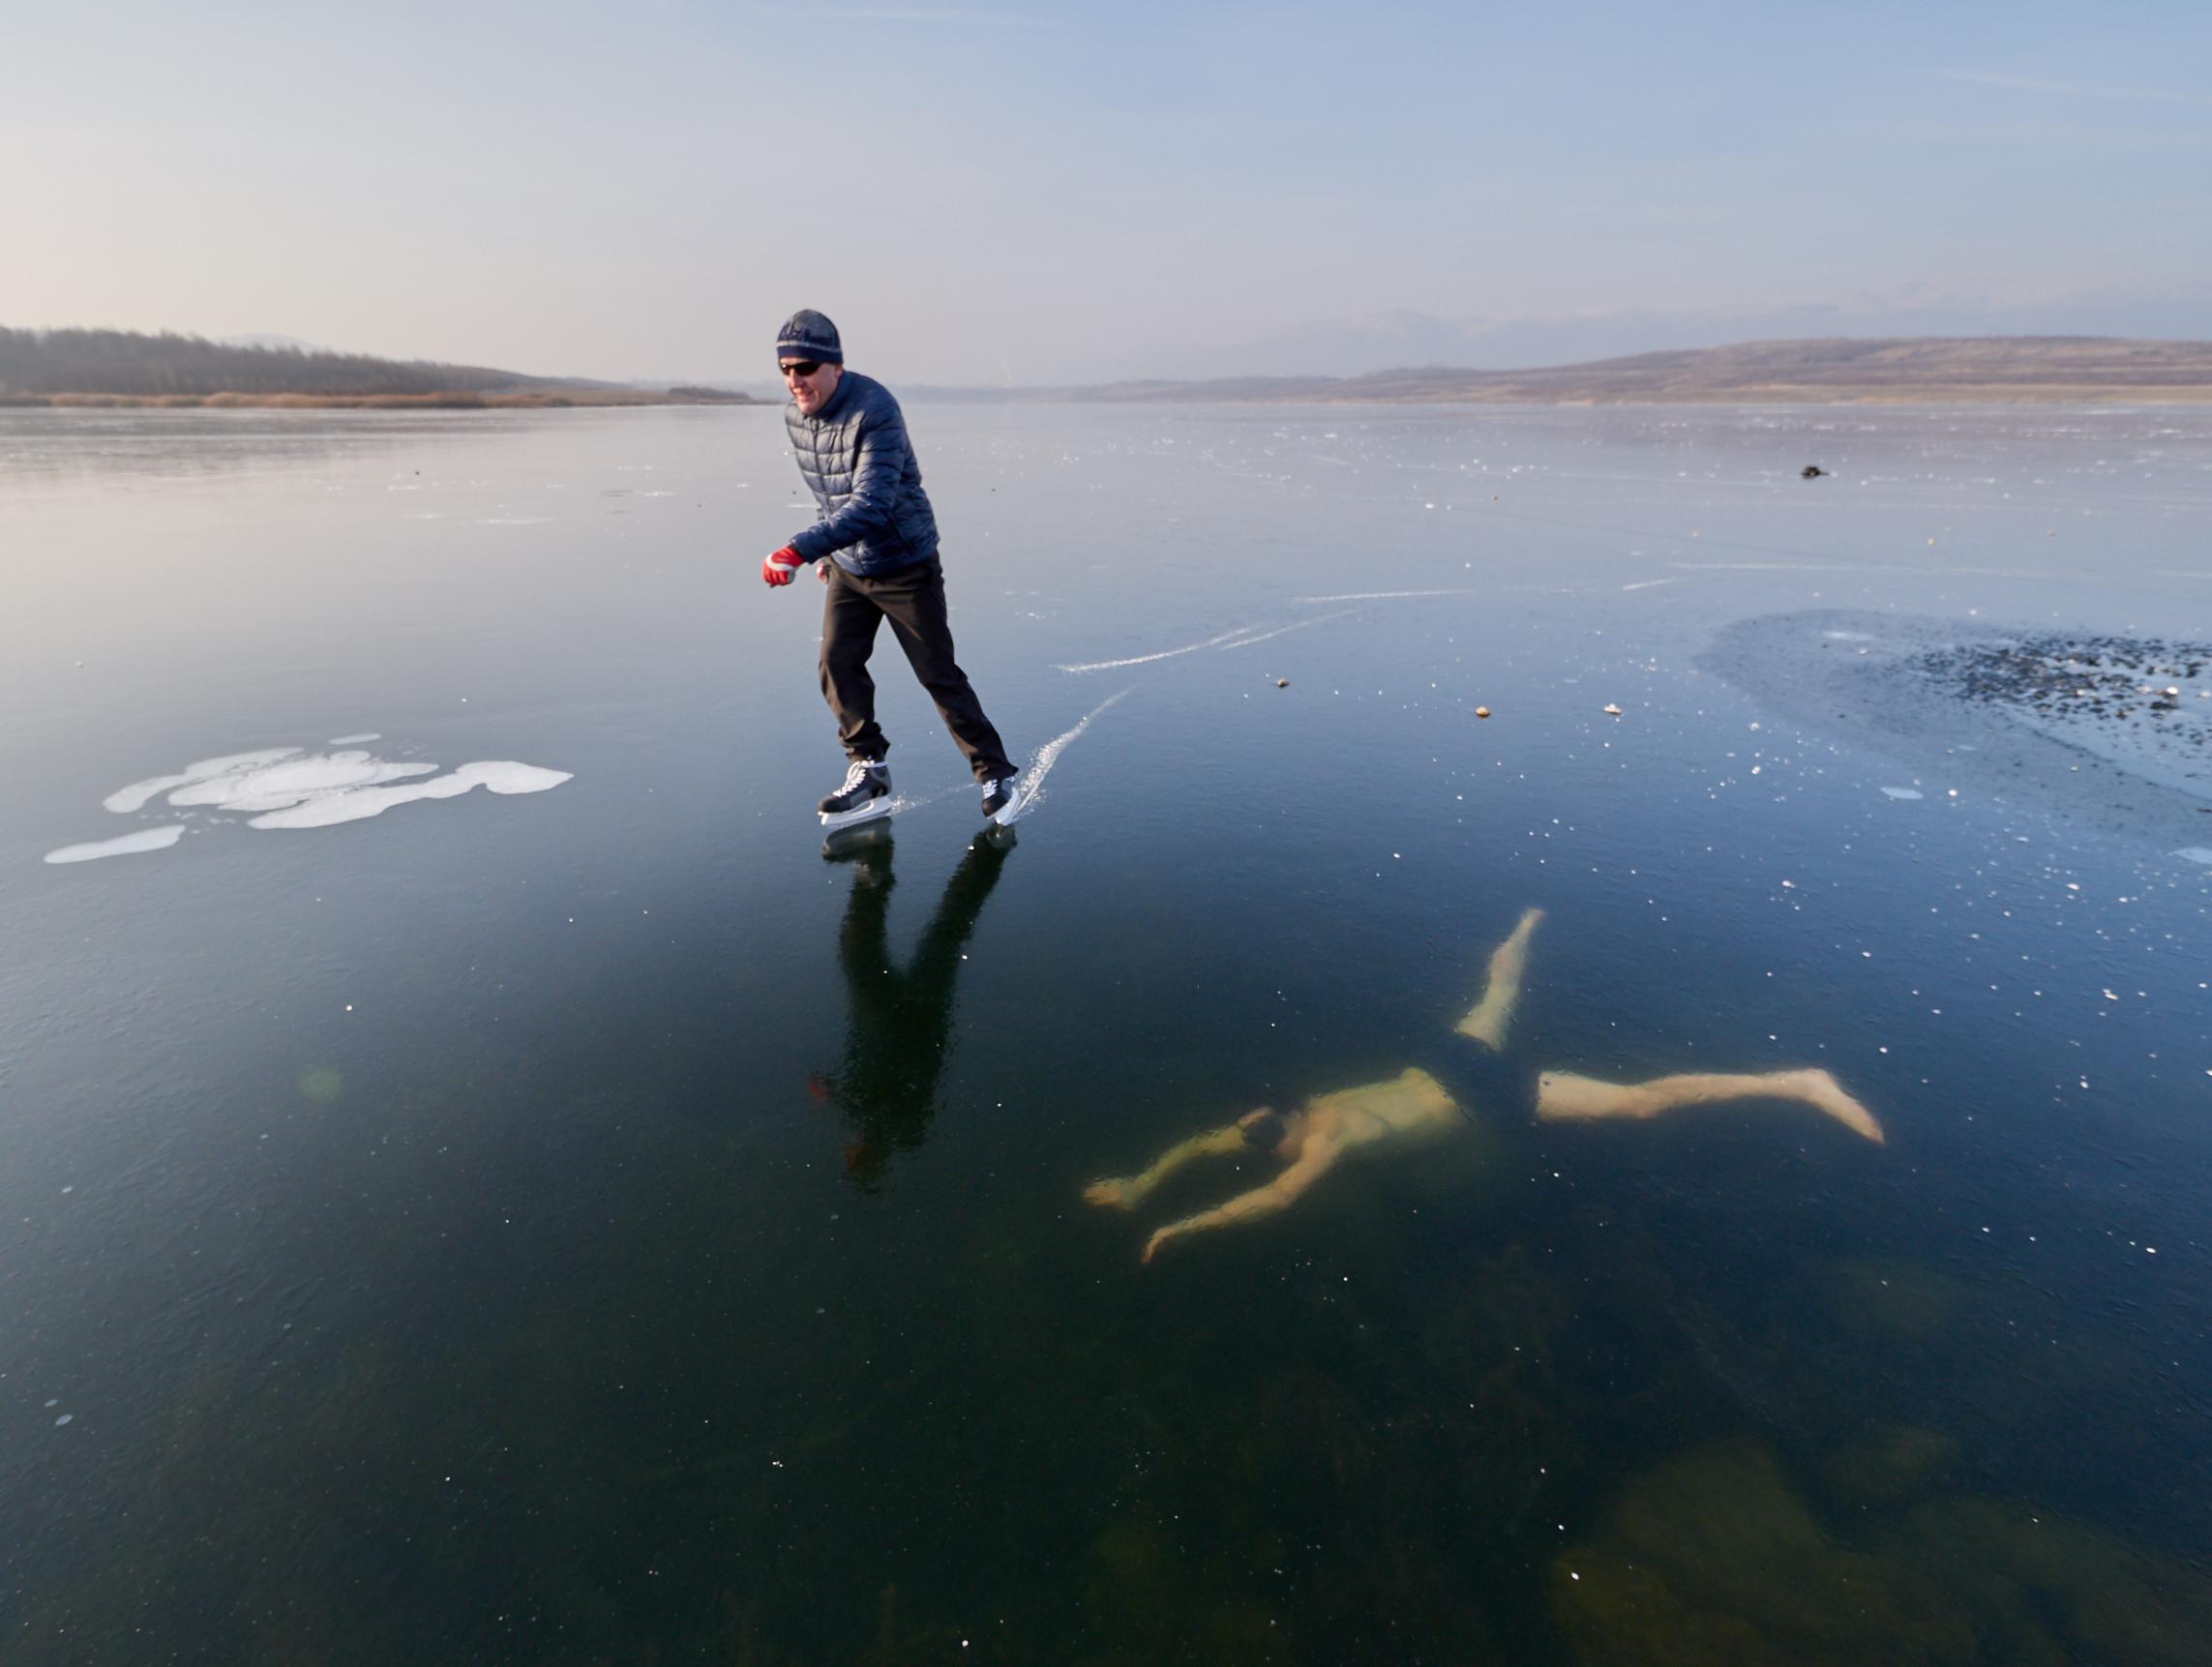 Milada Ice Freediving 2019